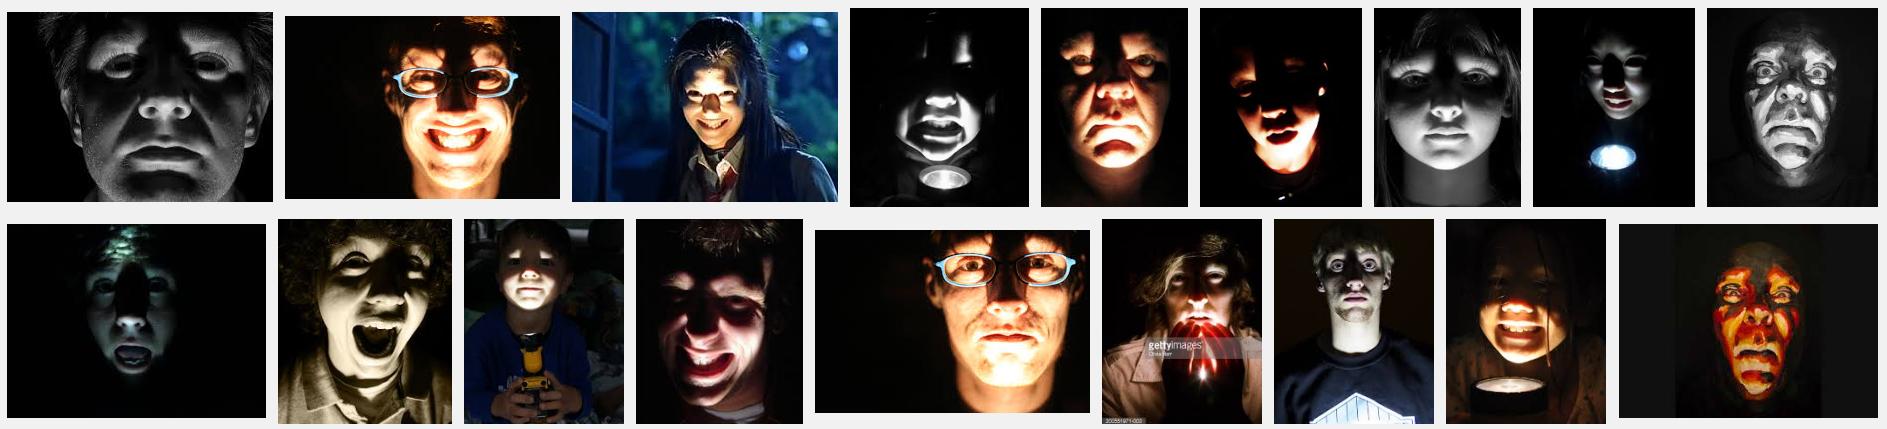 Flashlight Faces